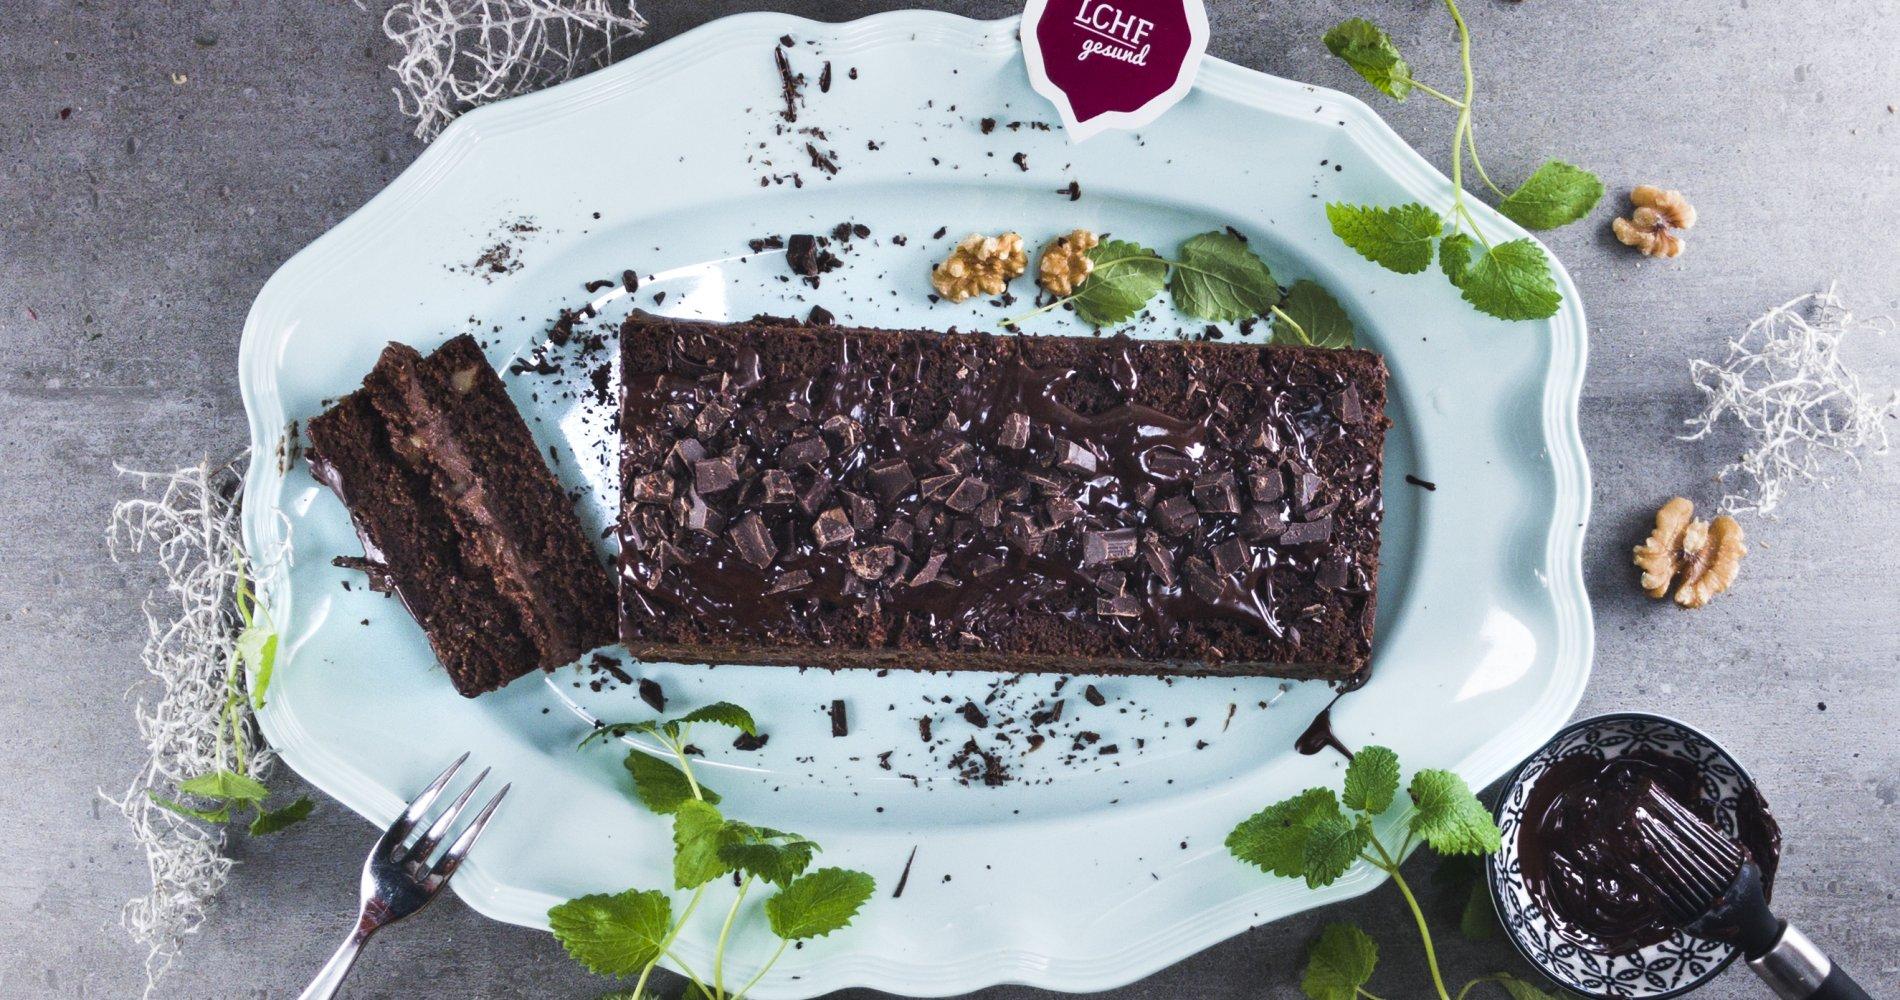 Low Carb: Schokoladen-Walnuss-Kuchen - Mega schokoladig und saftig